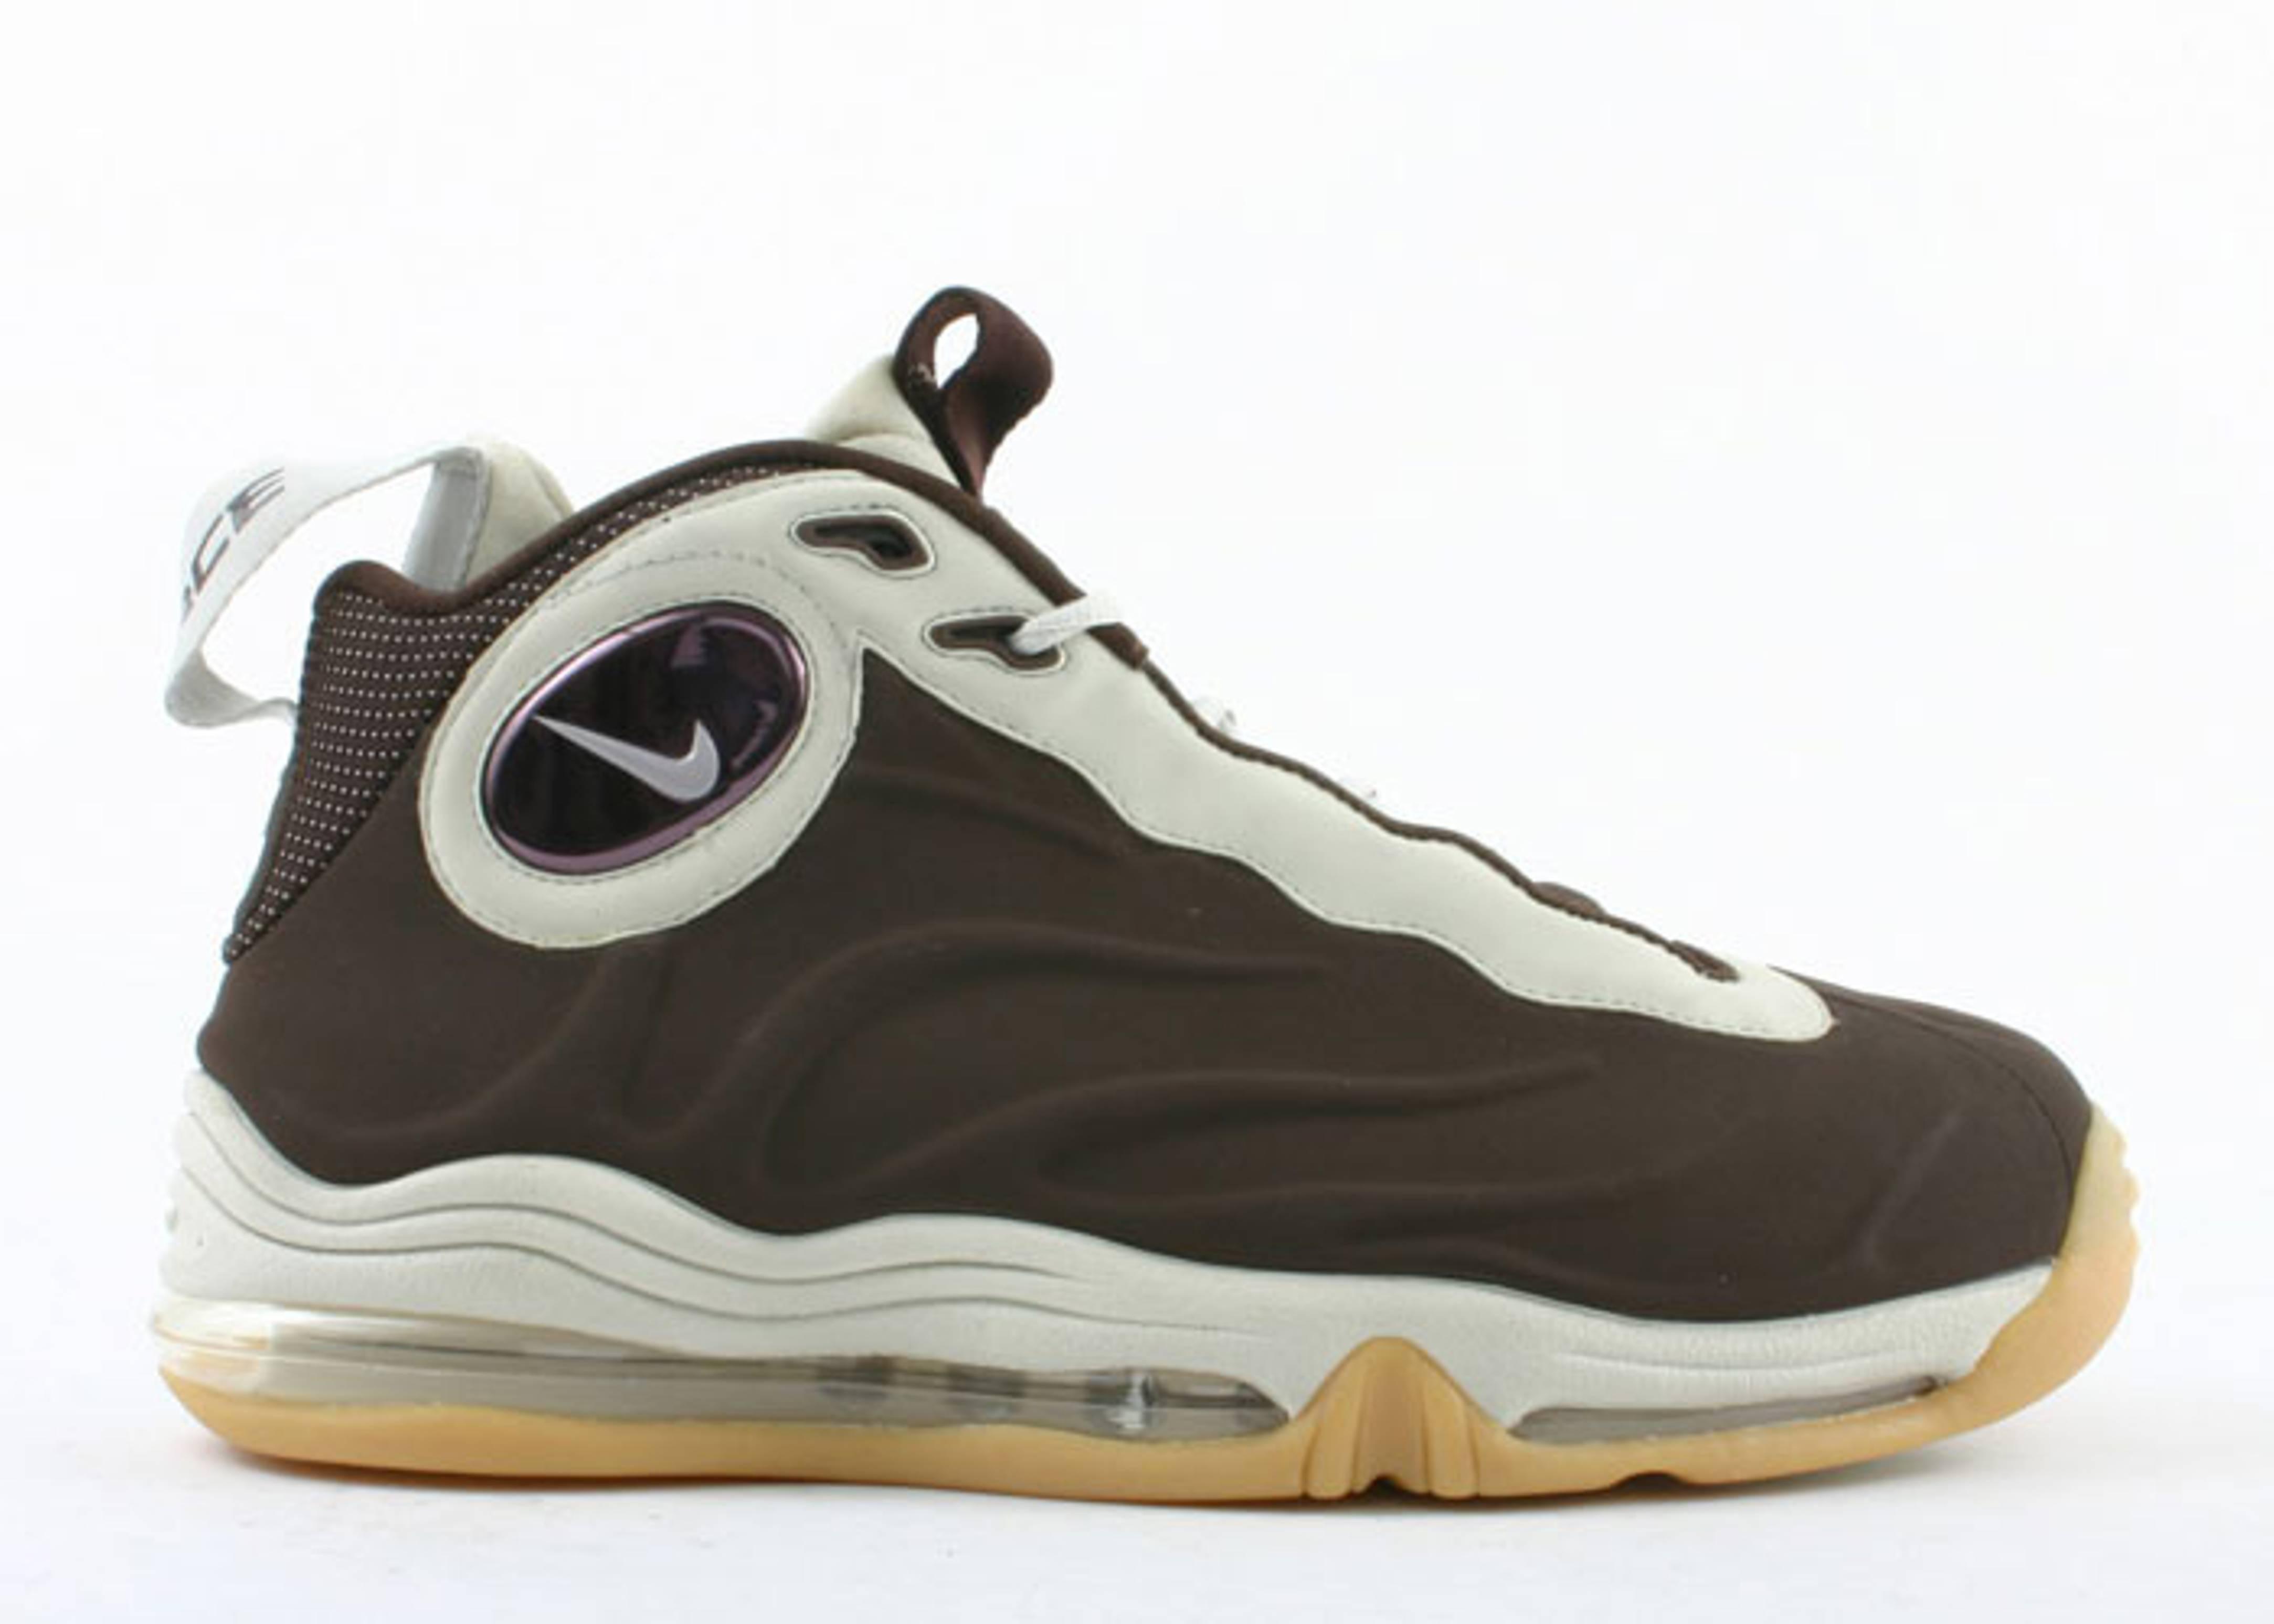 watch 4f52a 954ba Total Foamposite Max - Nike - 307717 201 - baroque brown/light bone |  Flight Club